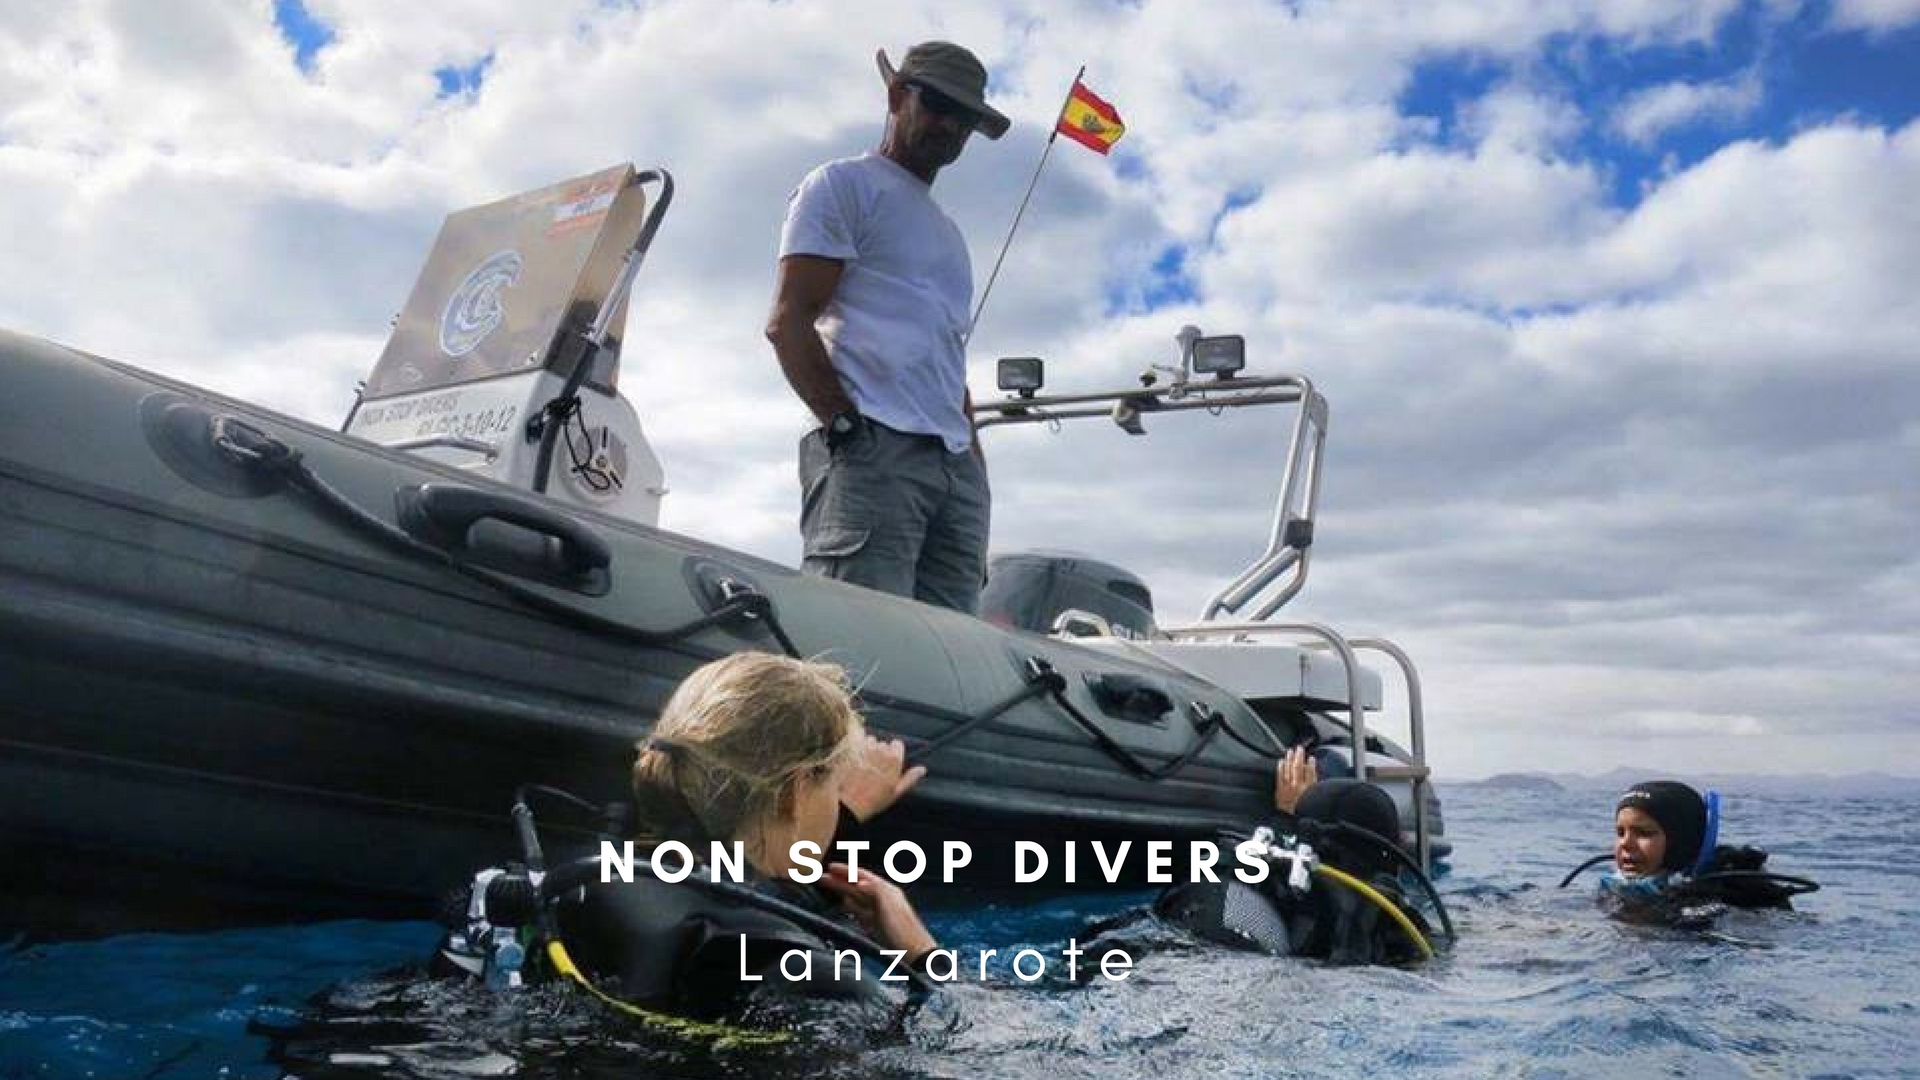 Non Stop Divers Lanzarote